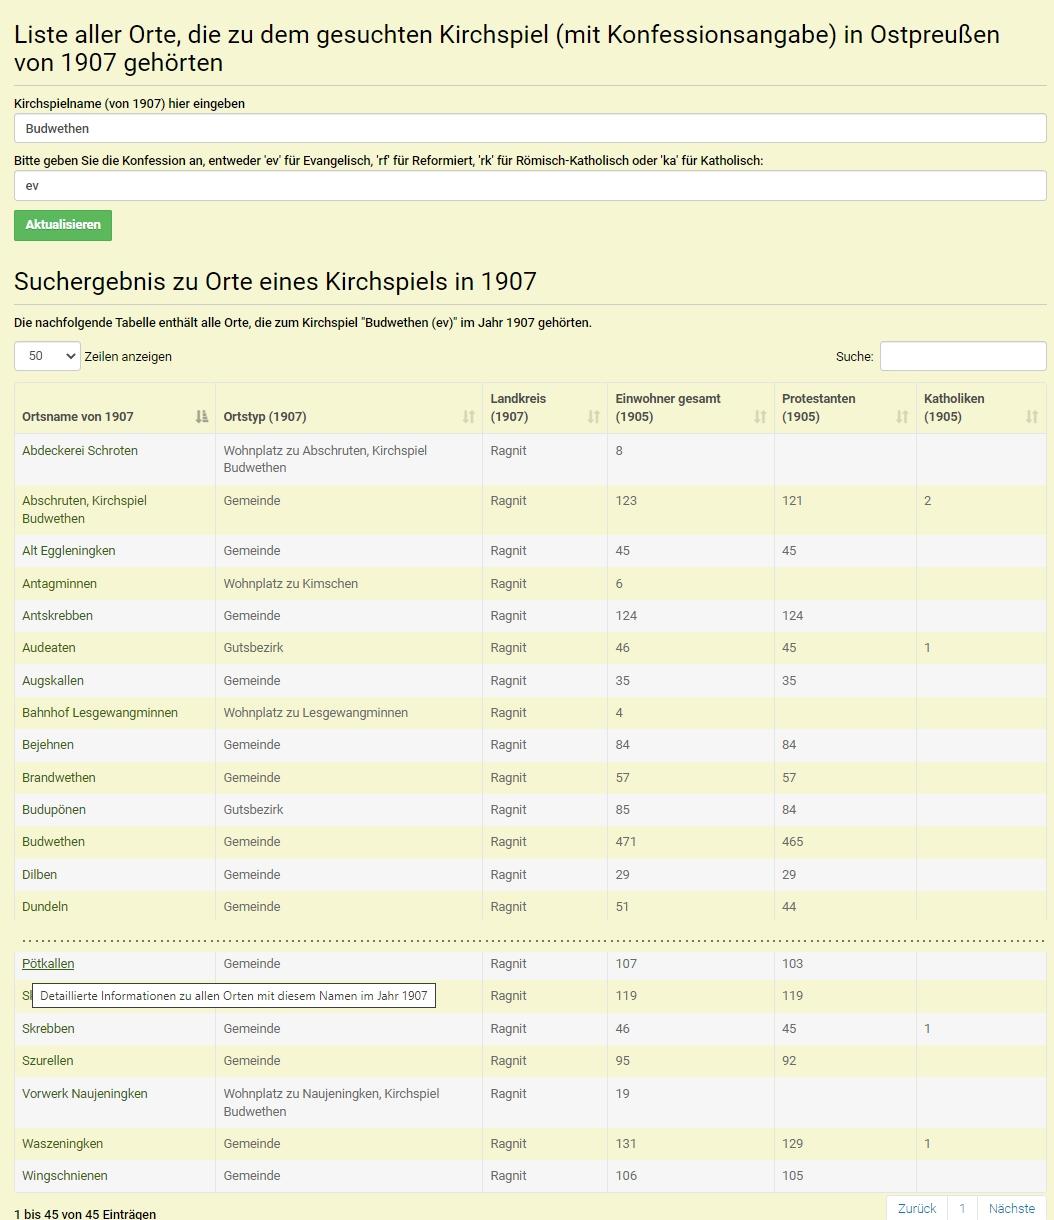 Kirchspiel 1907